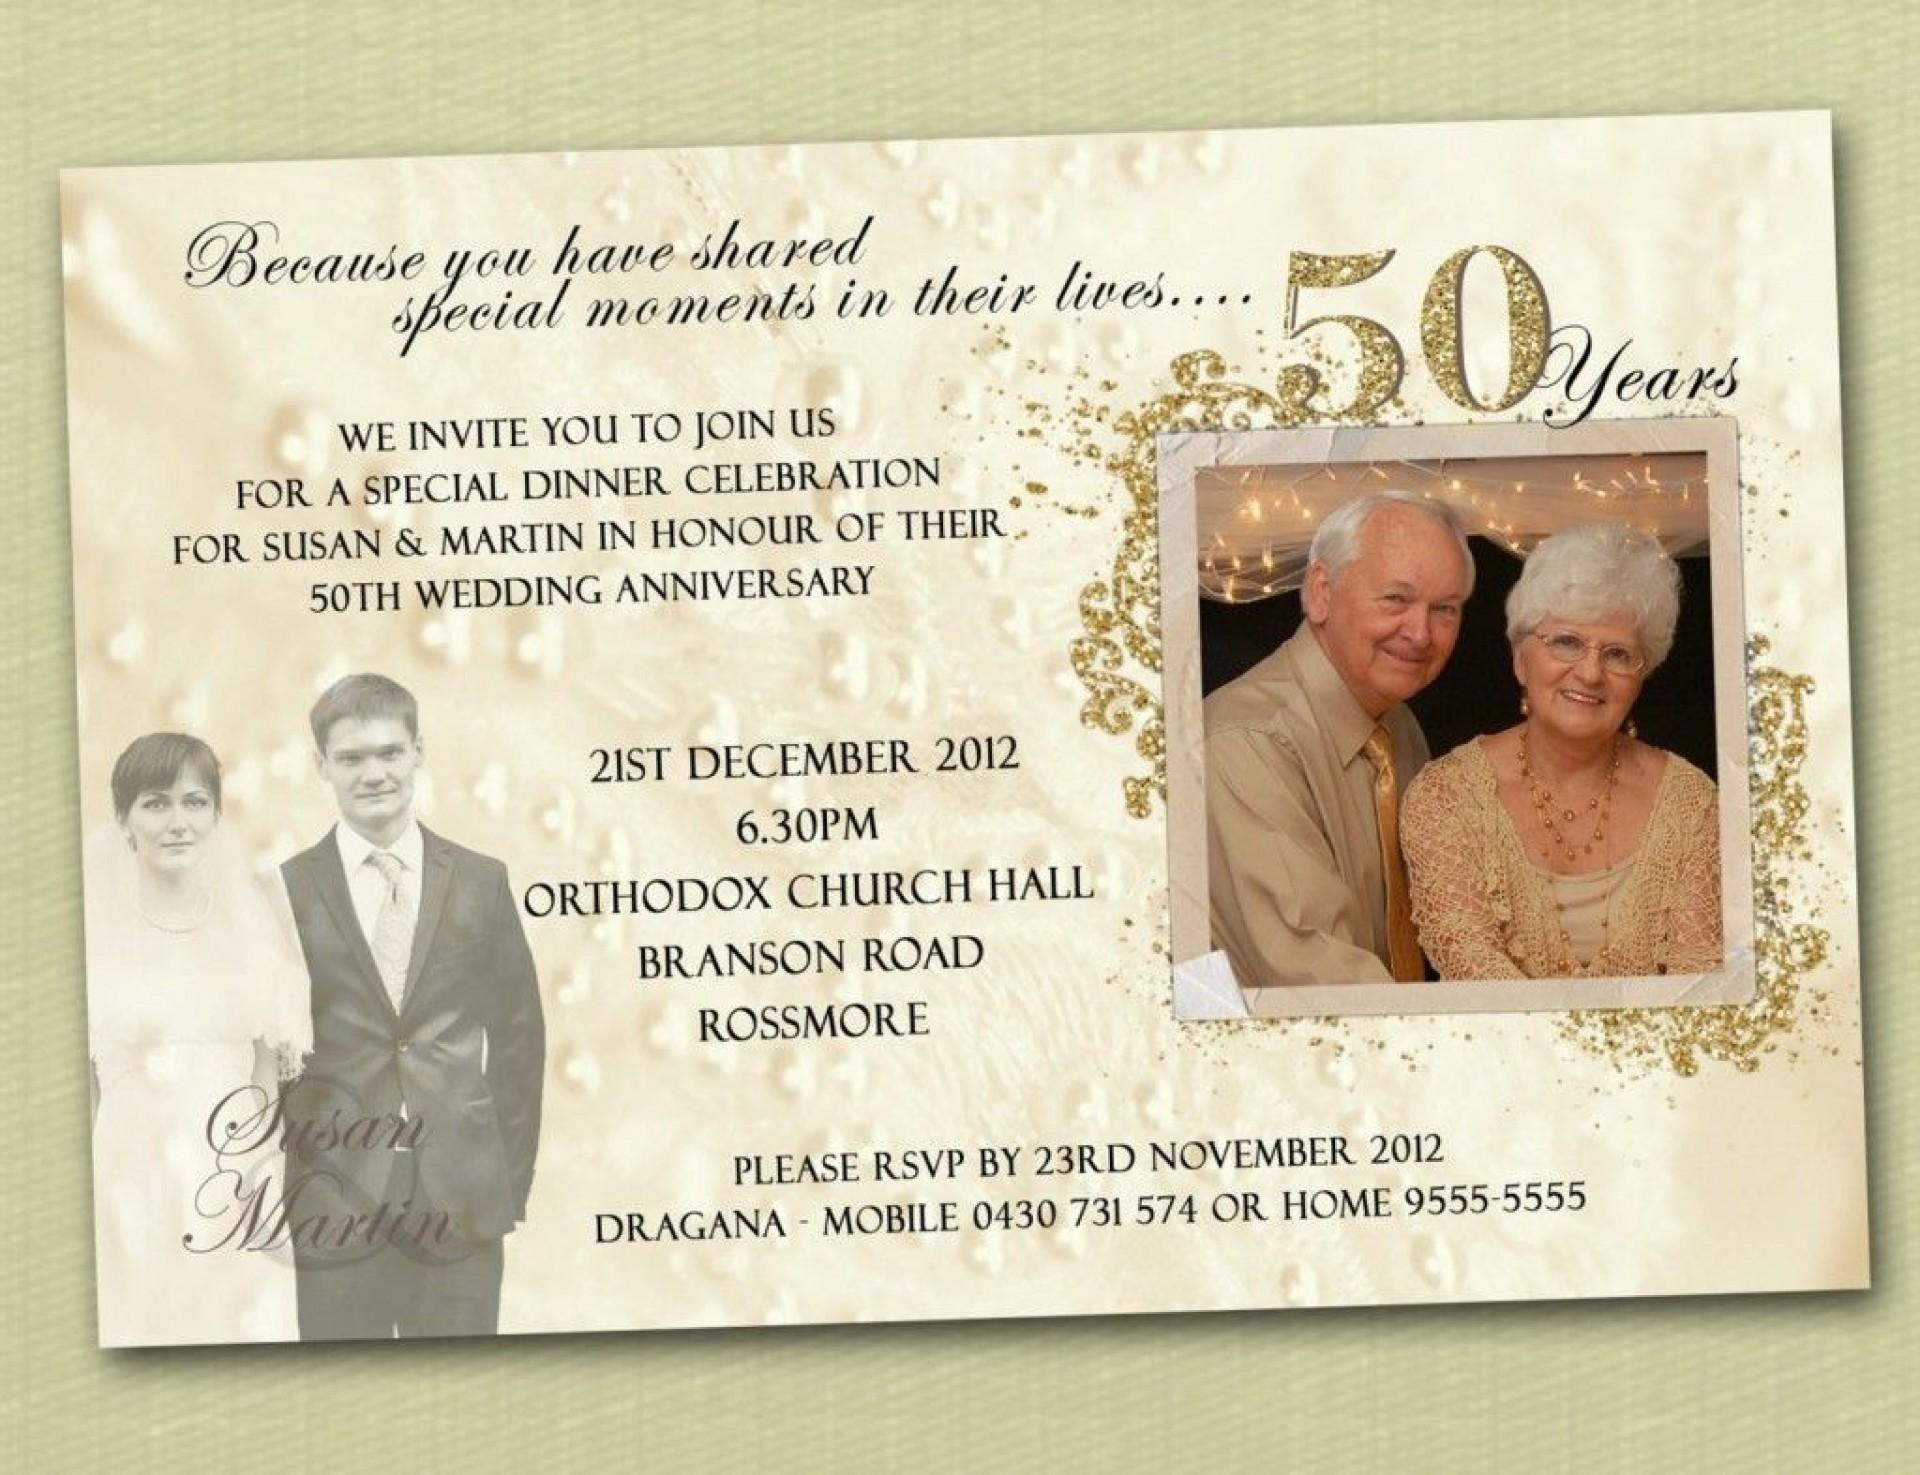 008 Impressive 50th Wedding Anniversary Invitation Card Template Image  Templates Sample1920